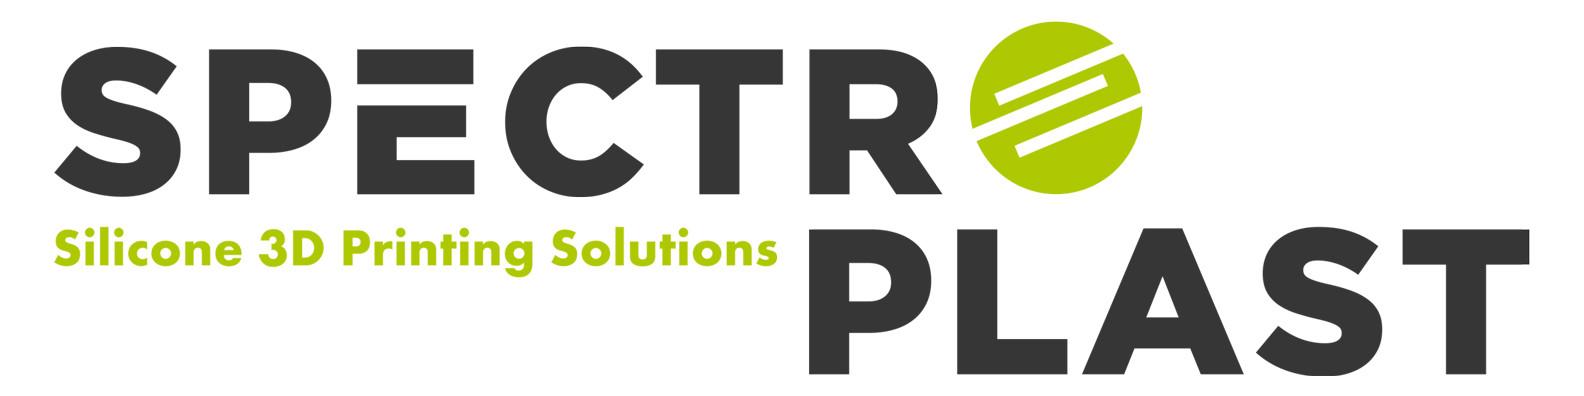 Spectroplast logo